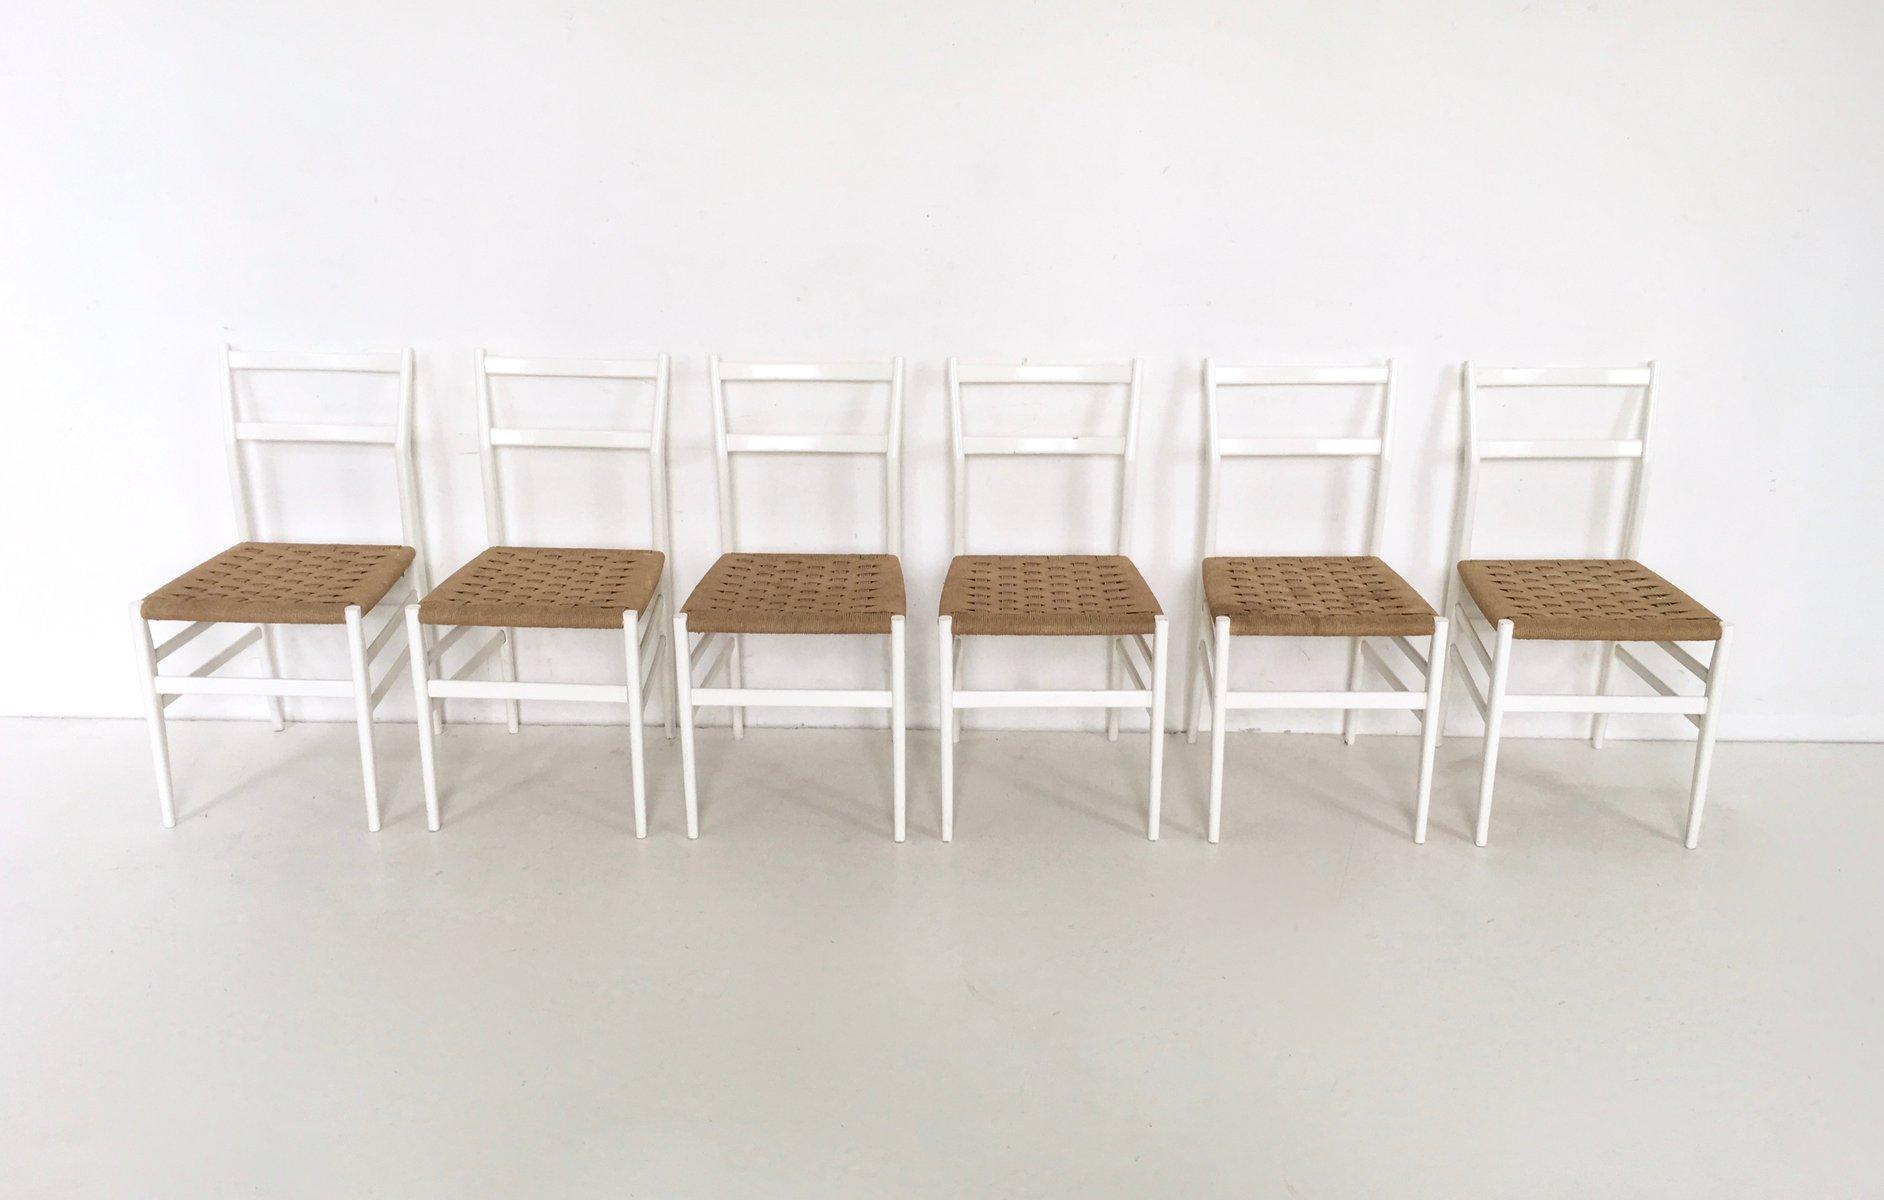 Leggera No 646 Chairs by Gio Ponti for Cassina 1952 Set of 12